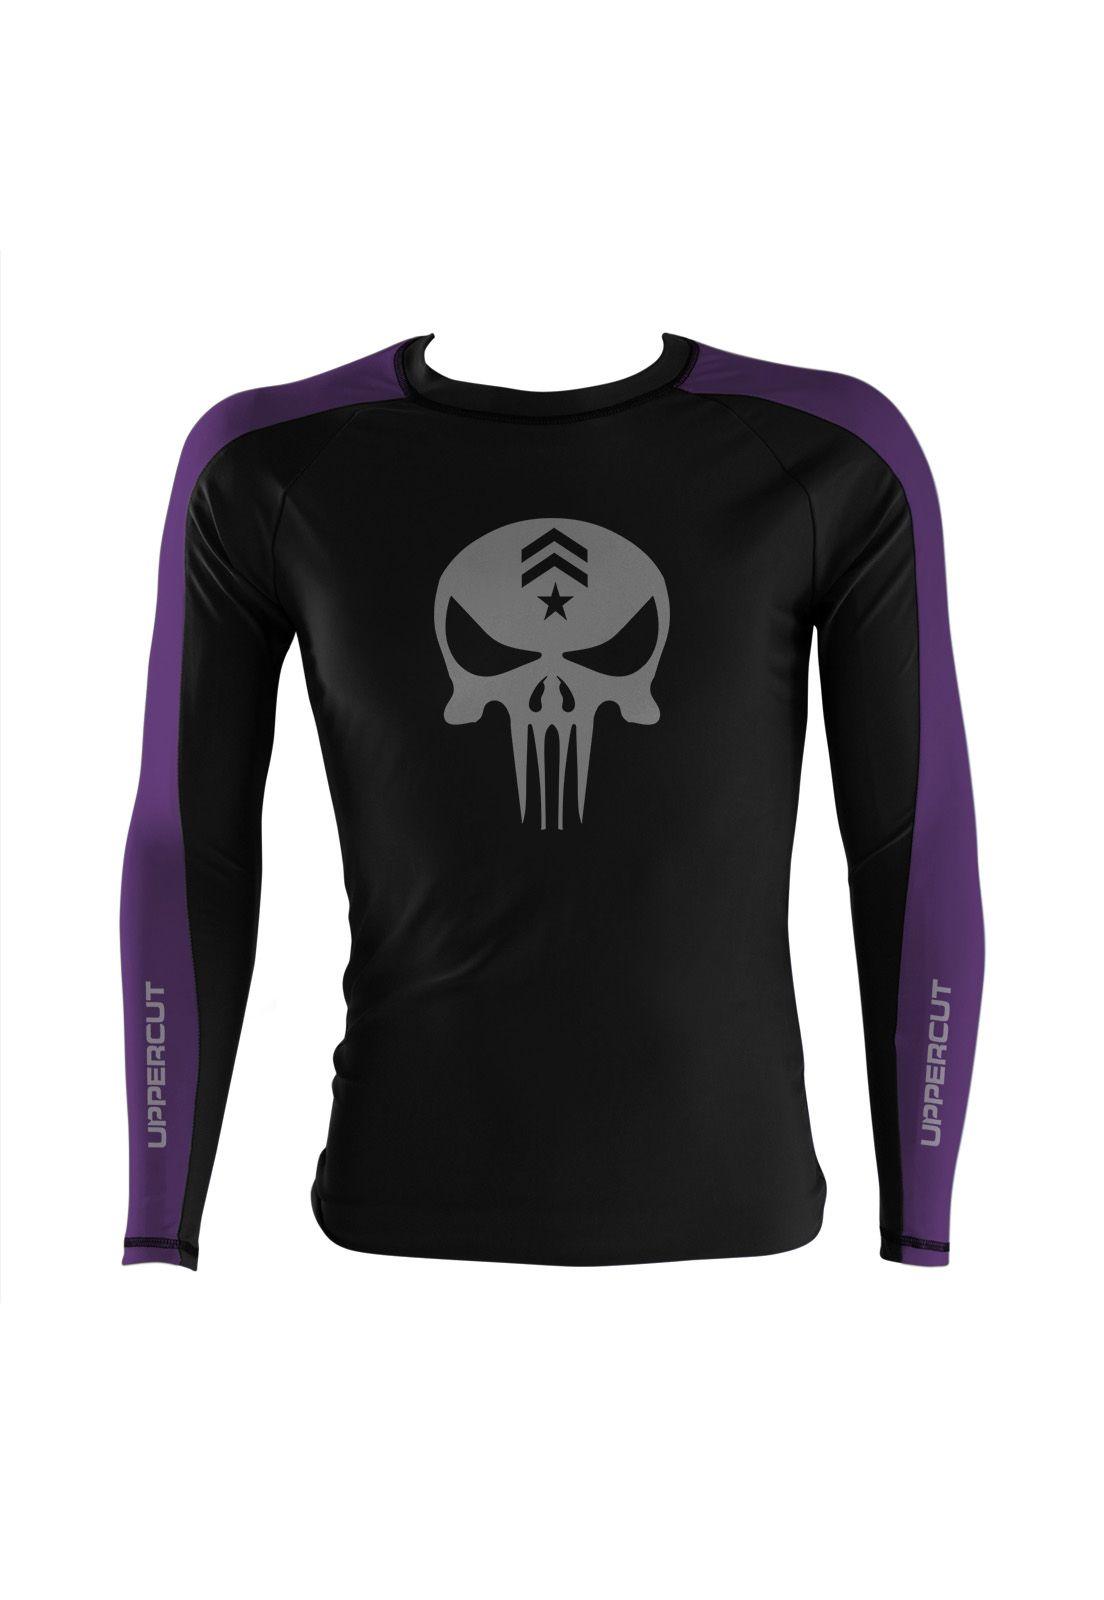 Camisa Rash Guard Justiceiro War R-3 - Preto/Roxa - Uppercut